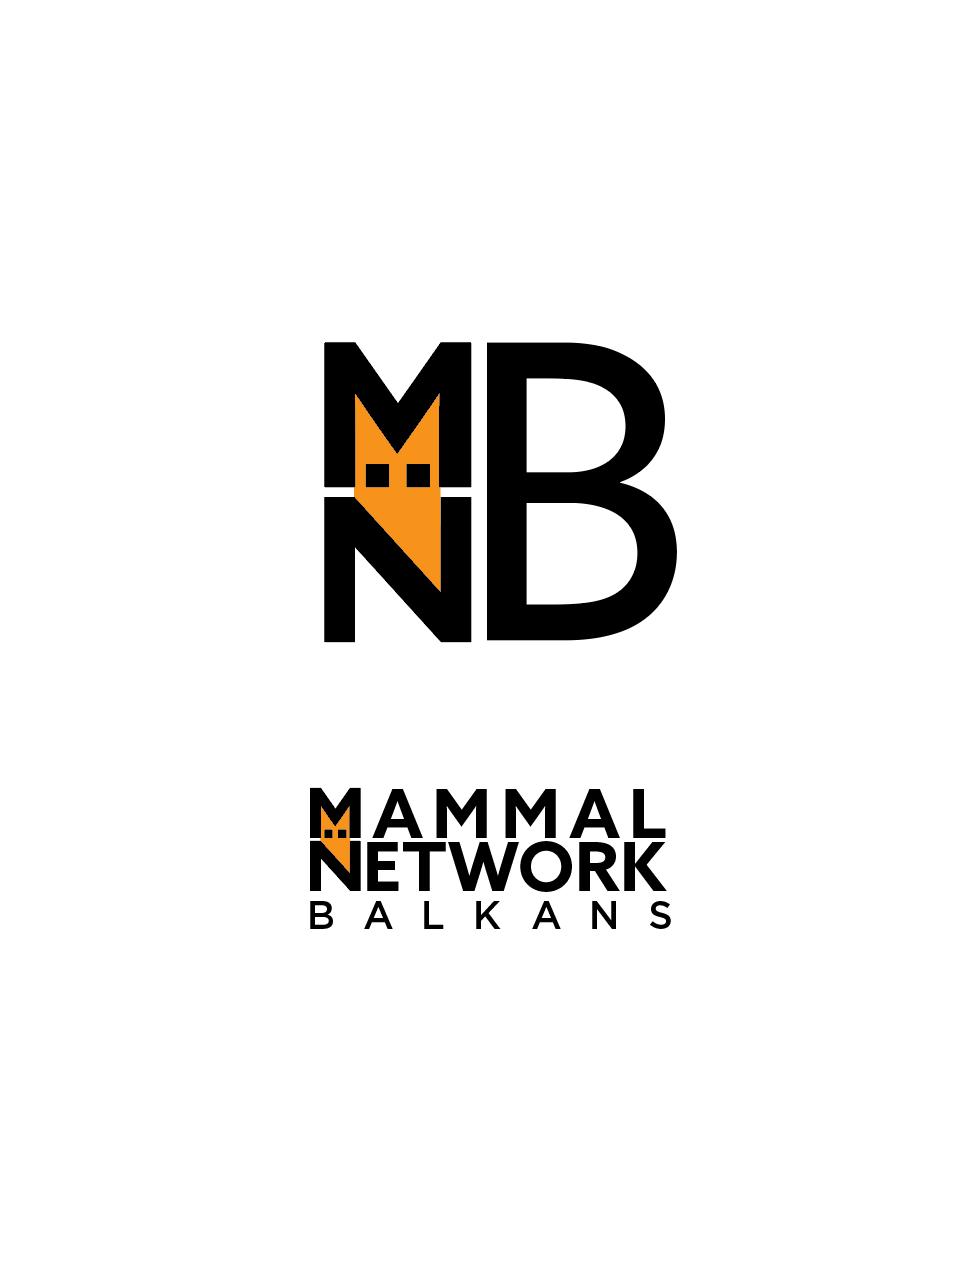 Logo Mammal Network Balkans